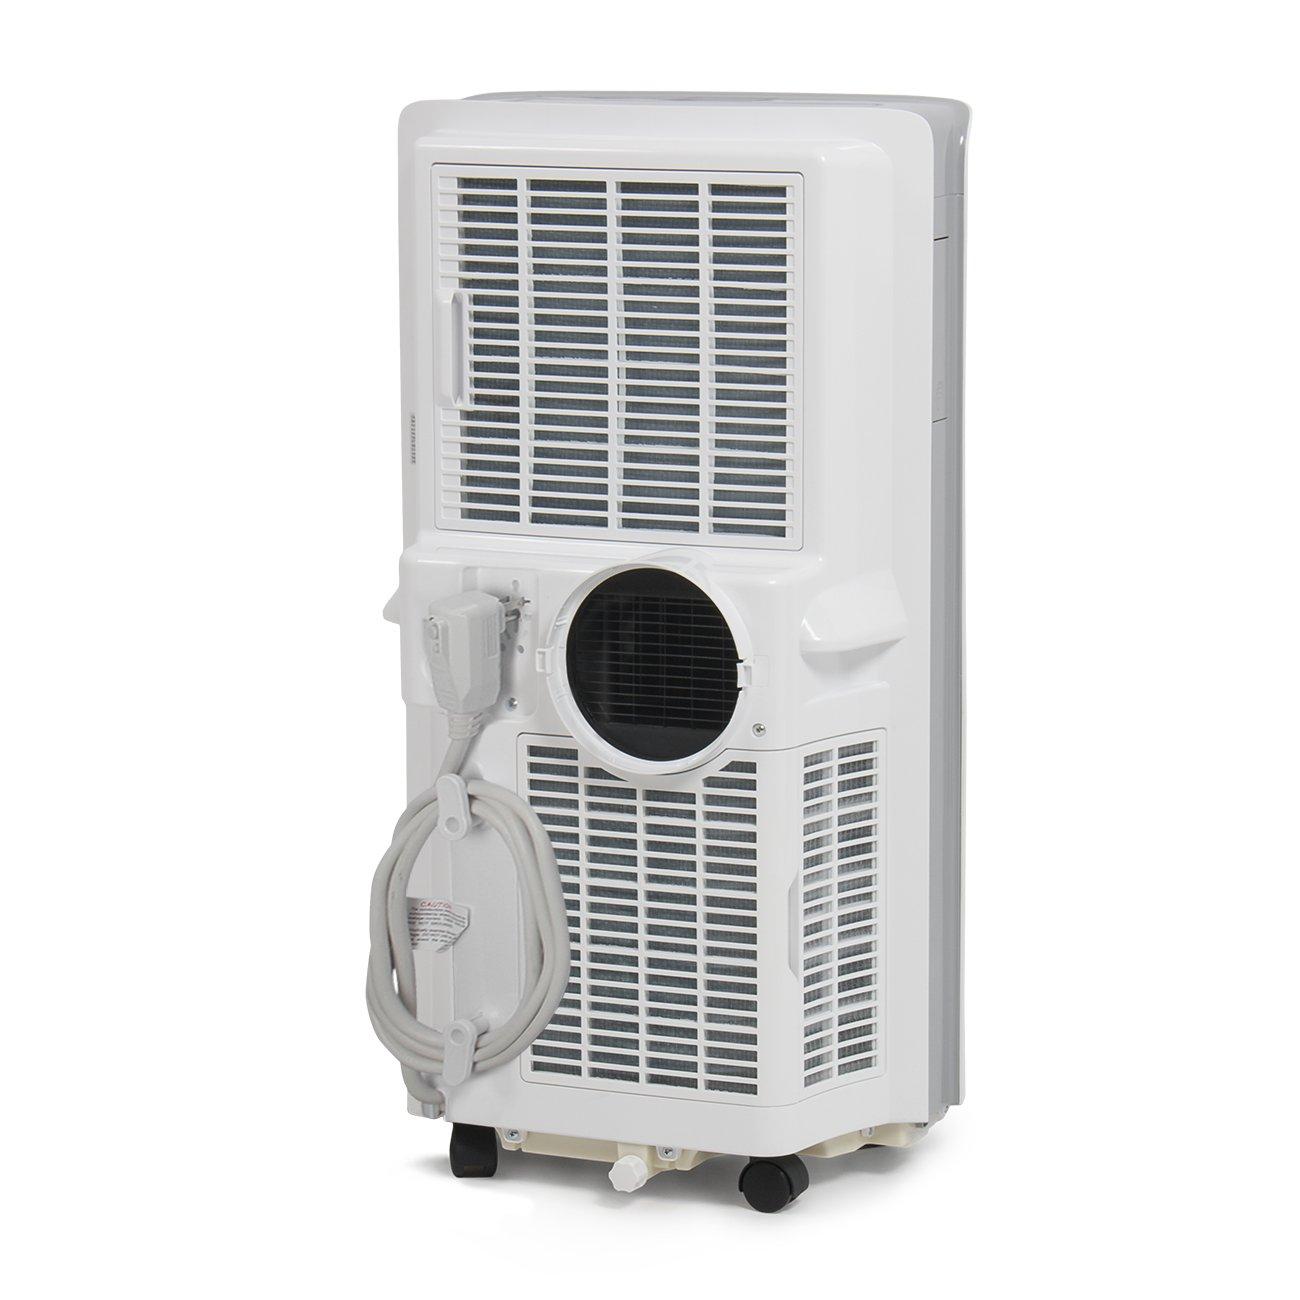 amazon com della 14 000 btu evaporative portable air conditioner